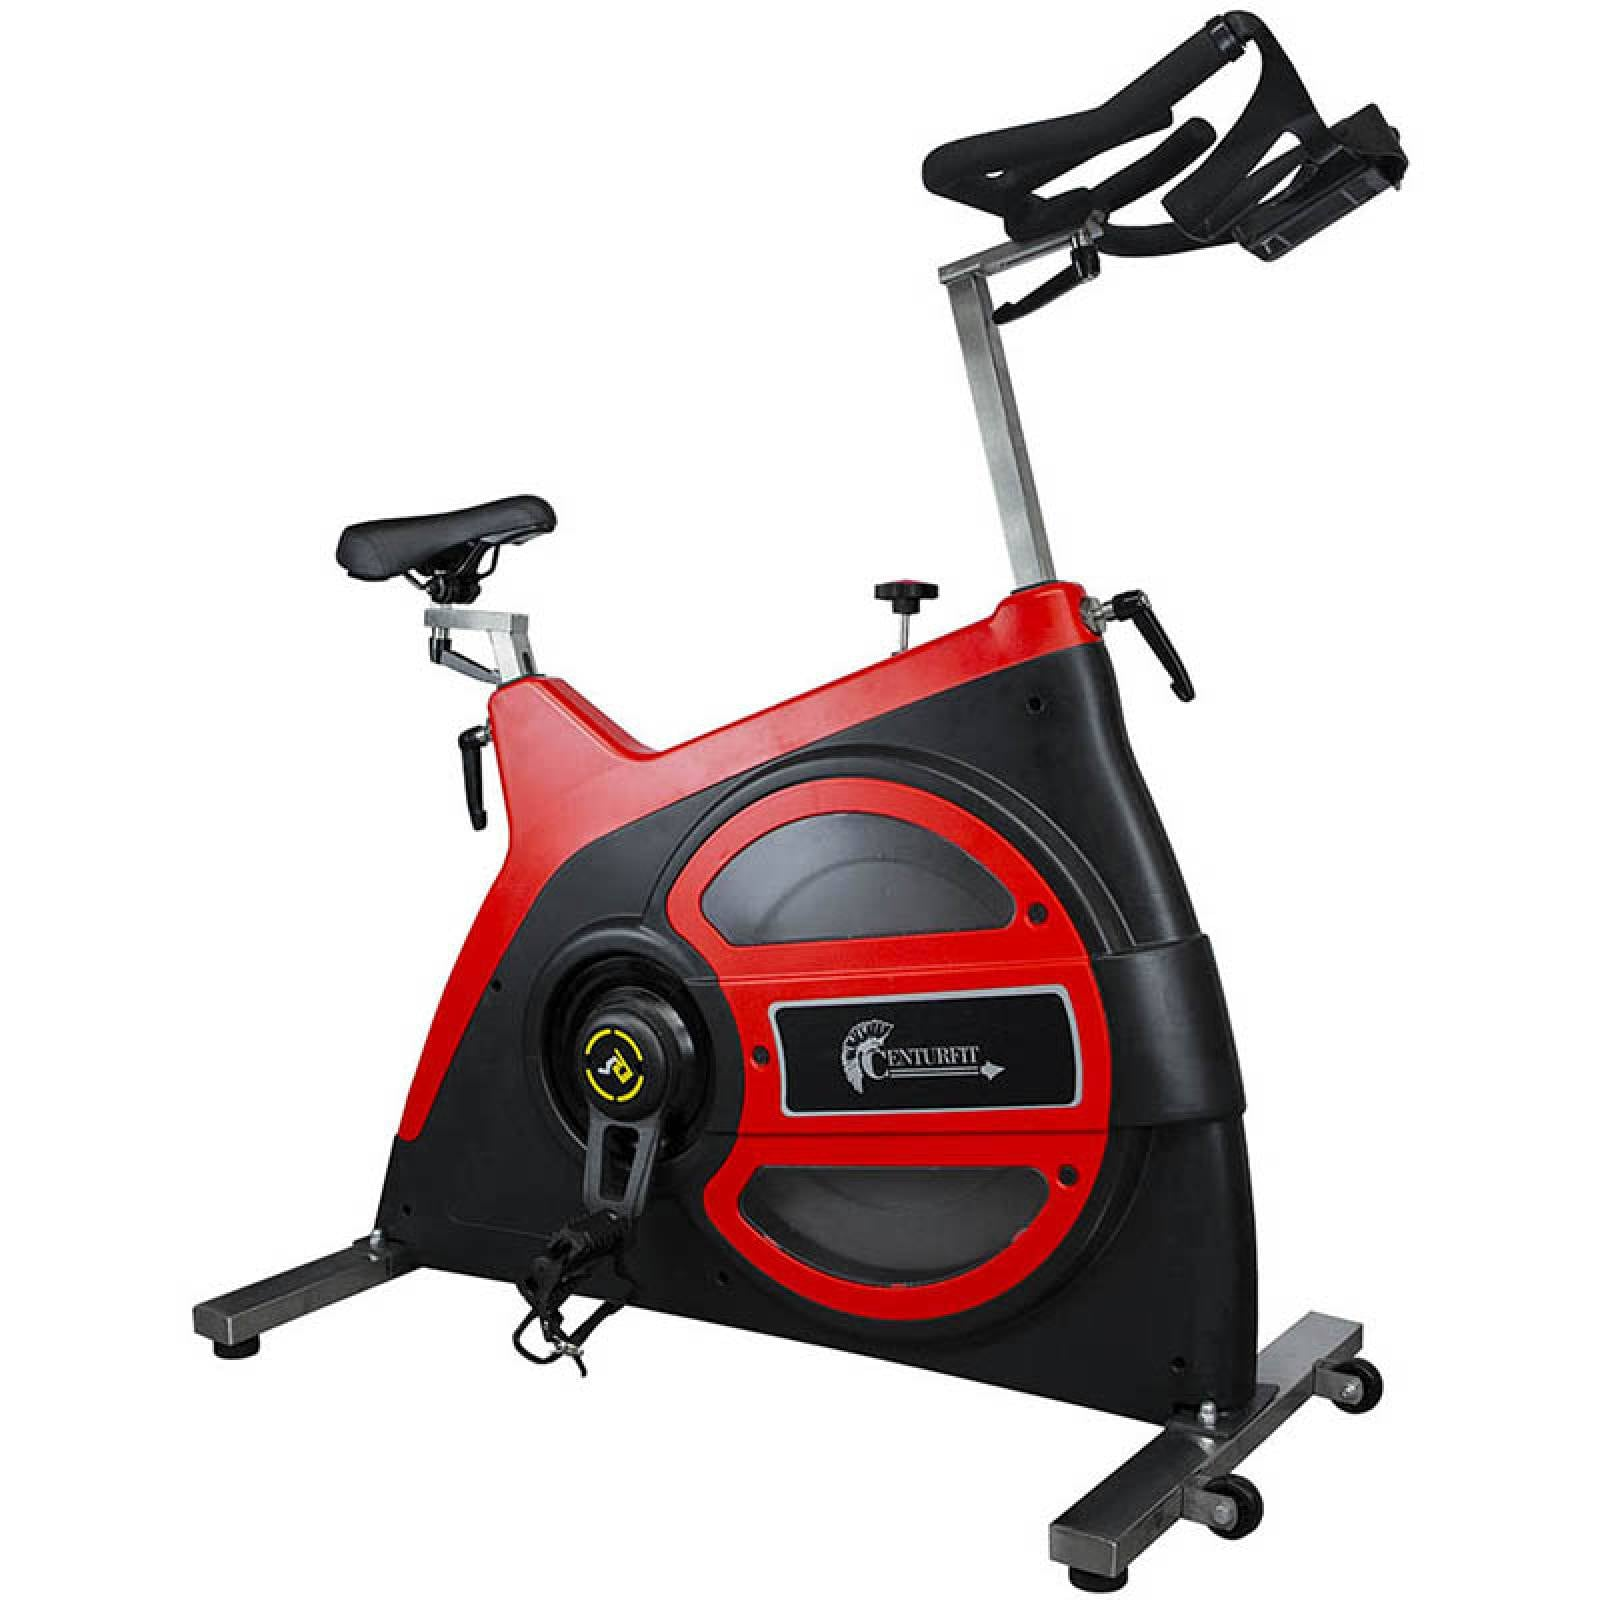 Bicicleta Spinning 20 kg Resistencia Magnetica Profesional Altura Ajustable Uso Rudo Centurfit